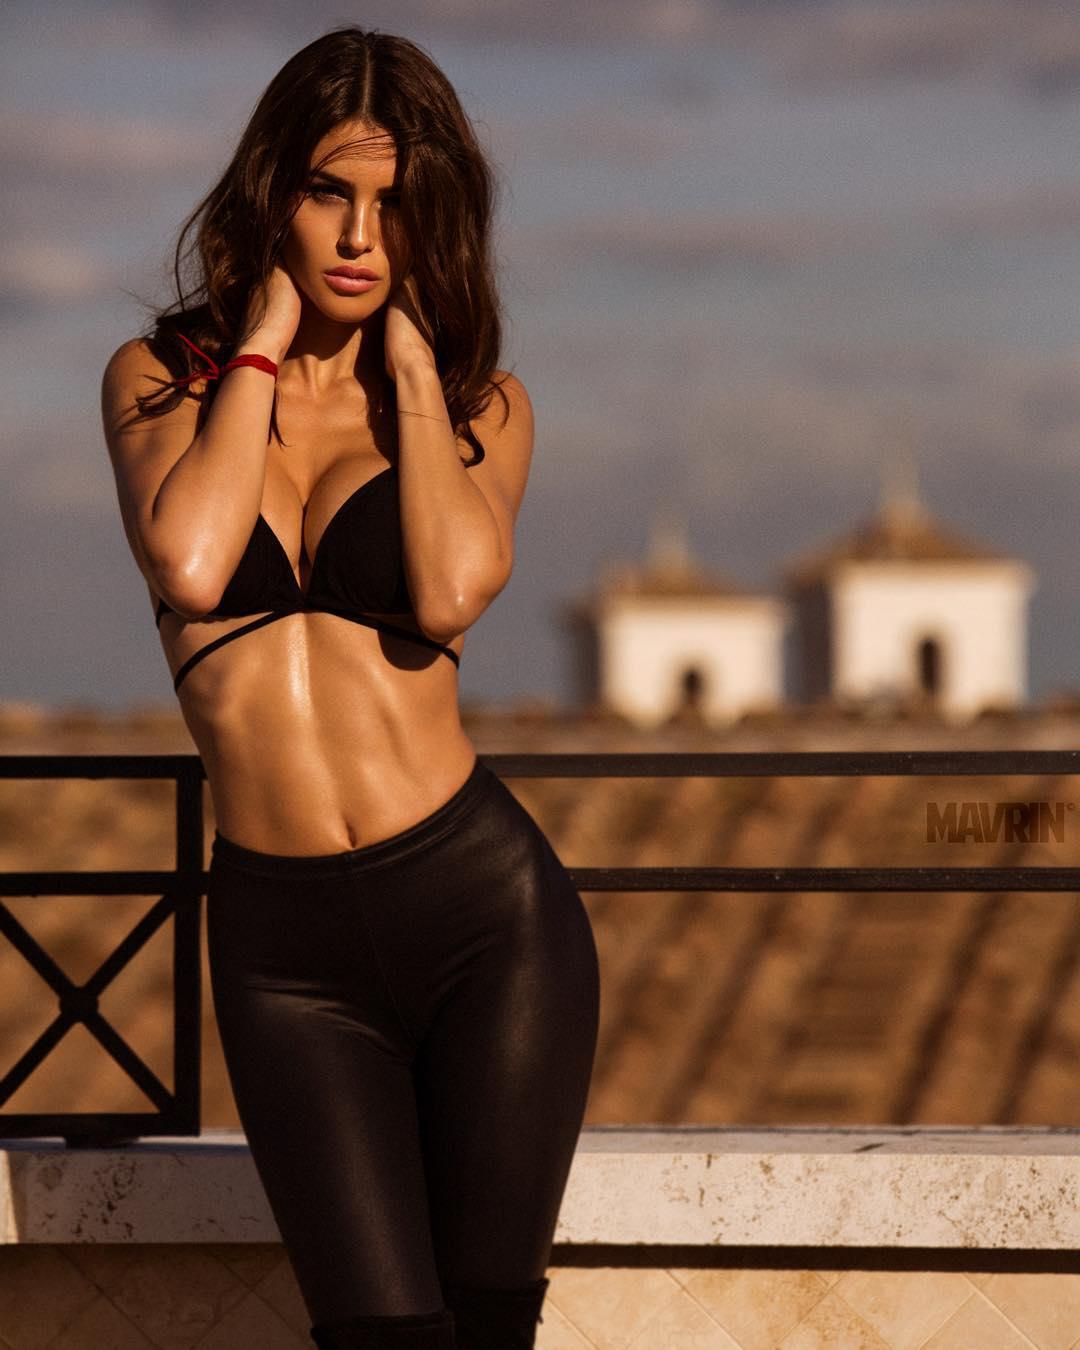 Silvia Caruso photos